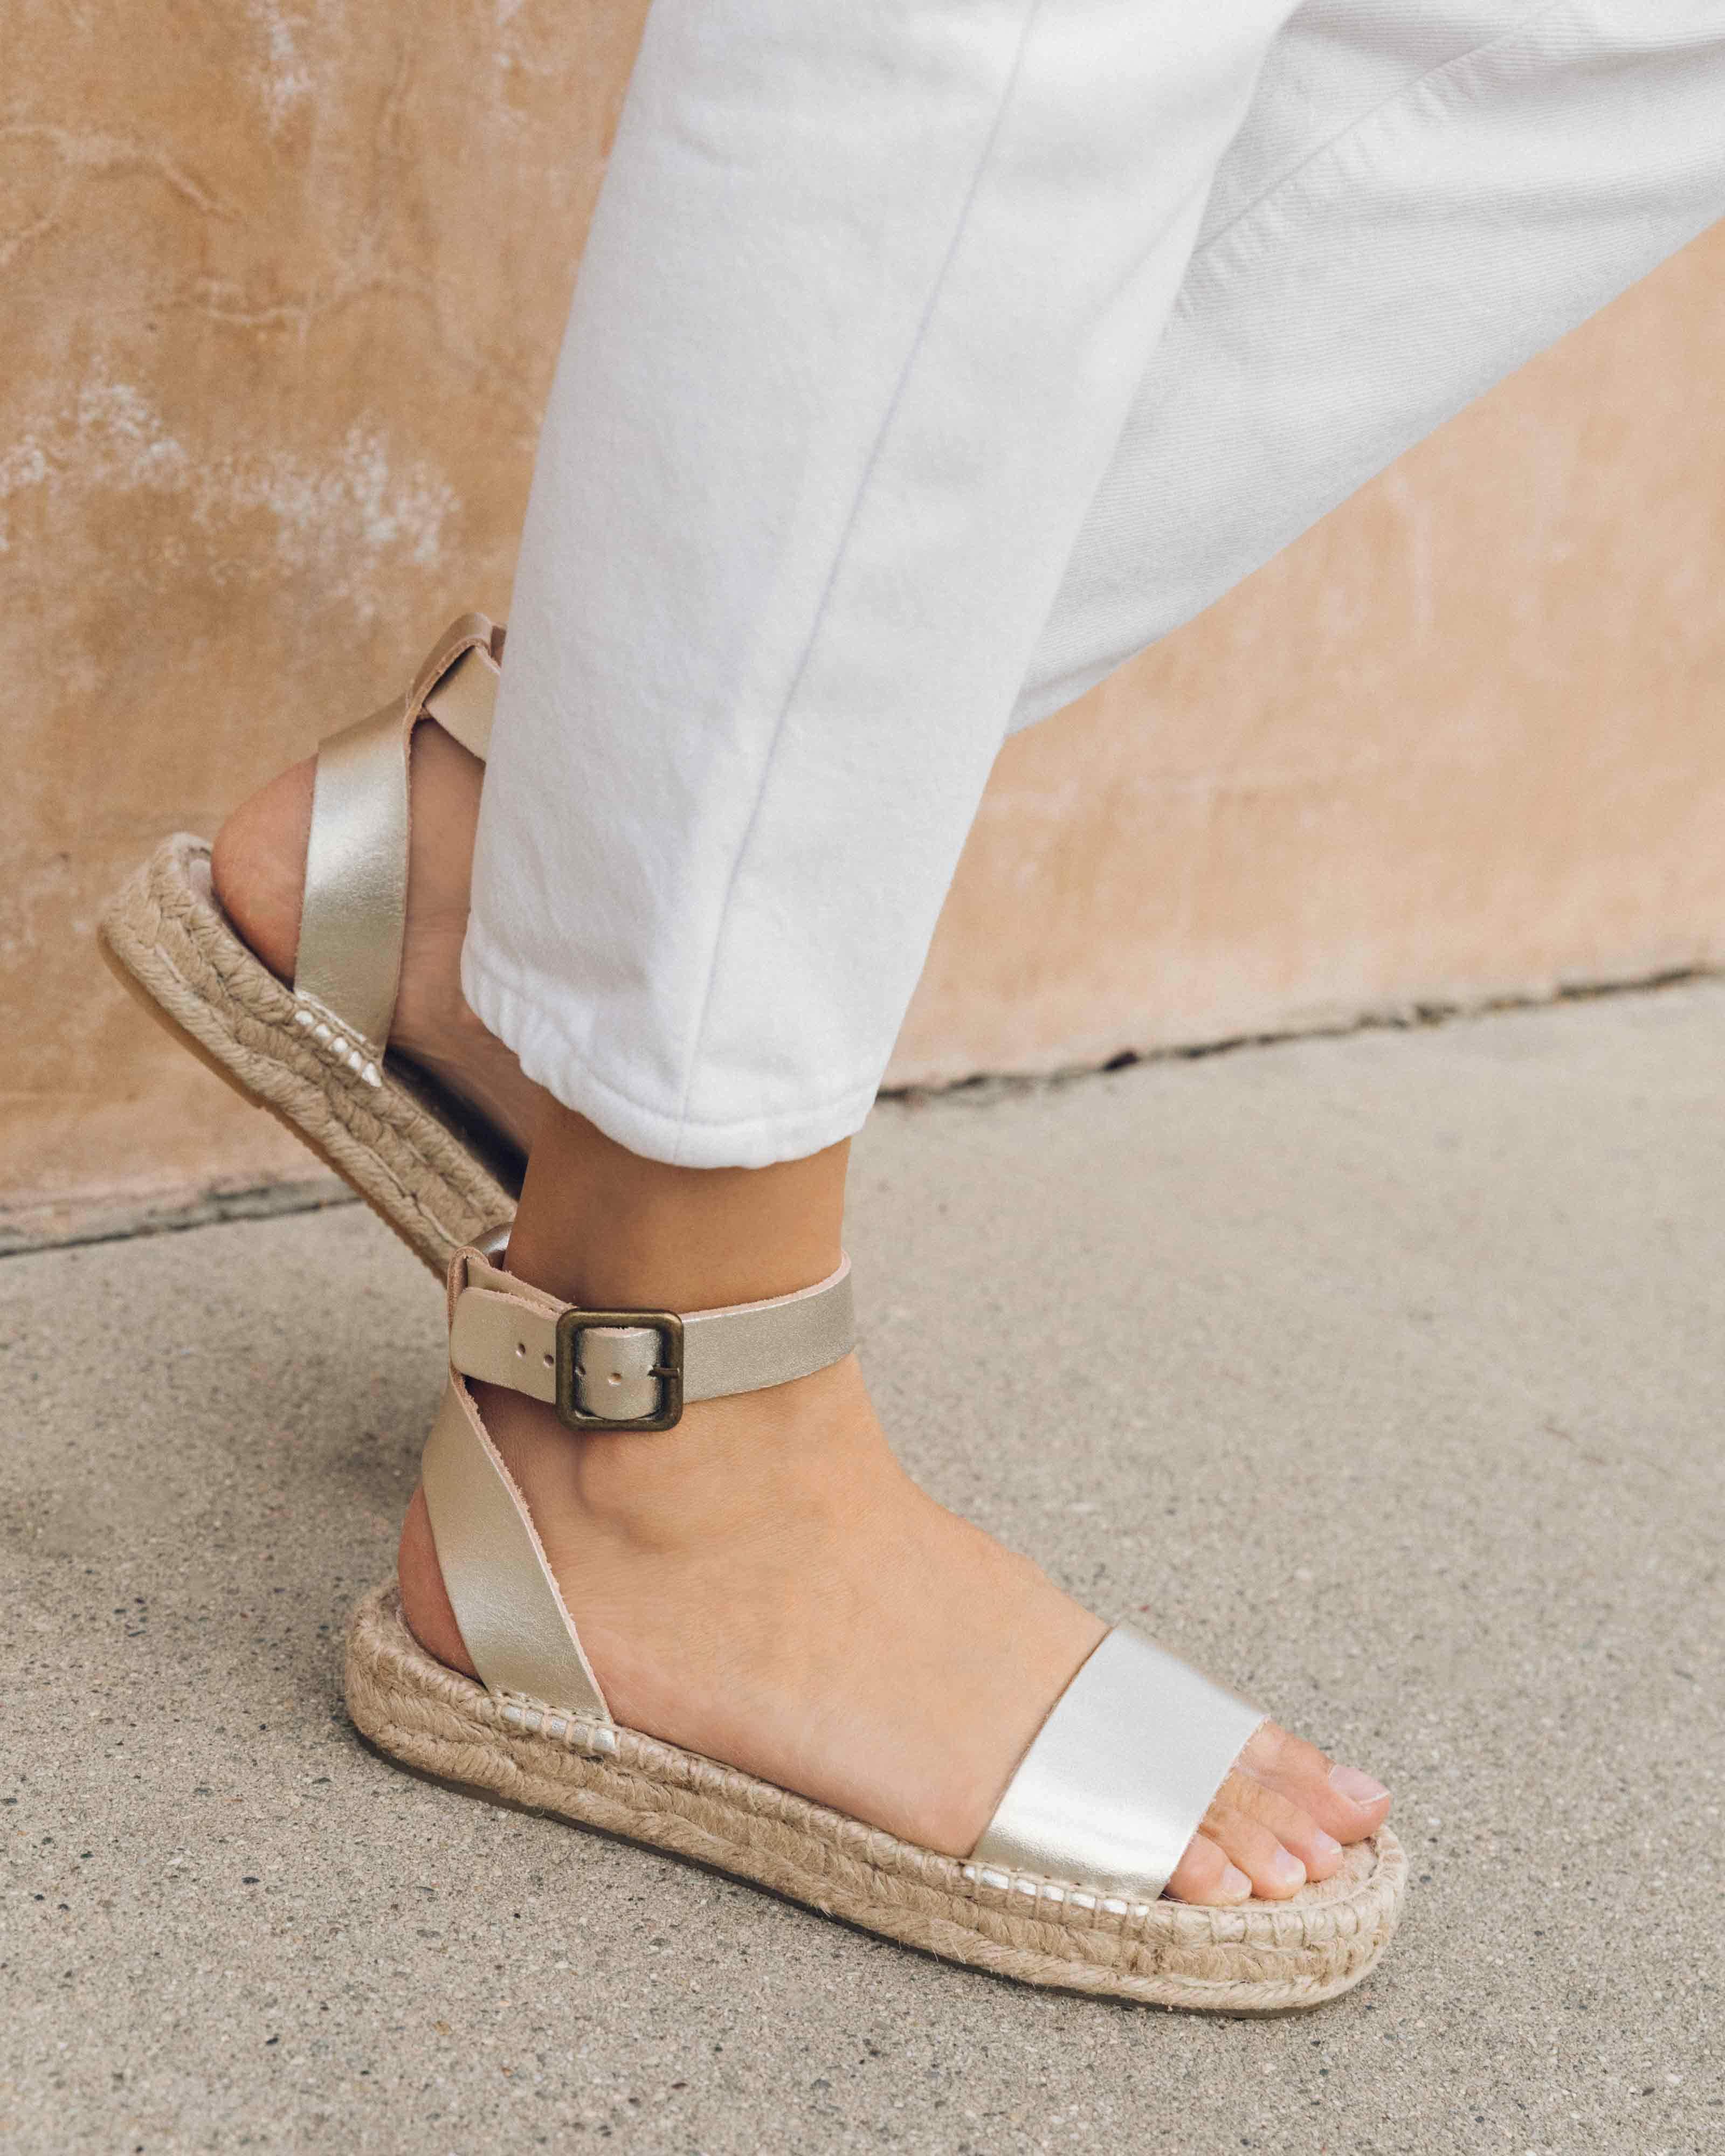 b76a2d191b27 Lyst - Soludos Cadiz Sandal